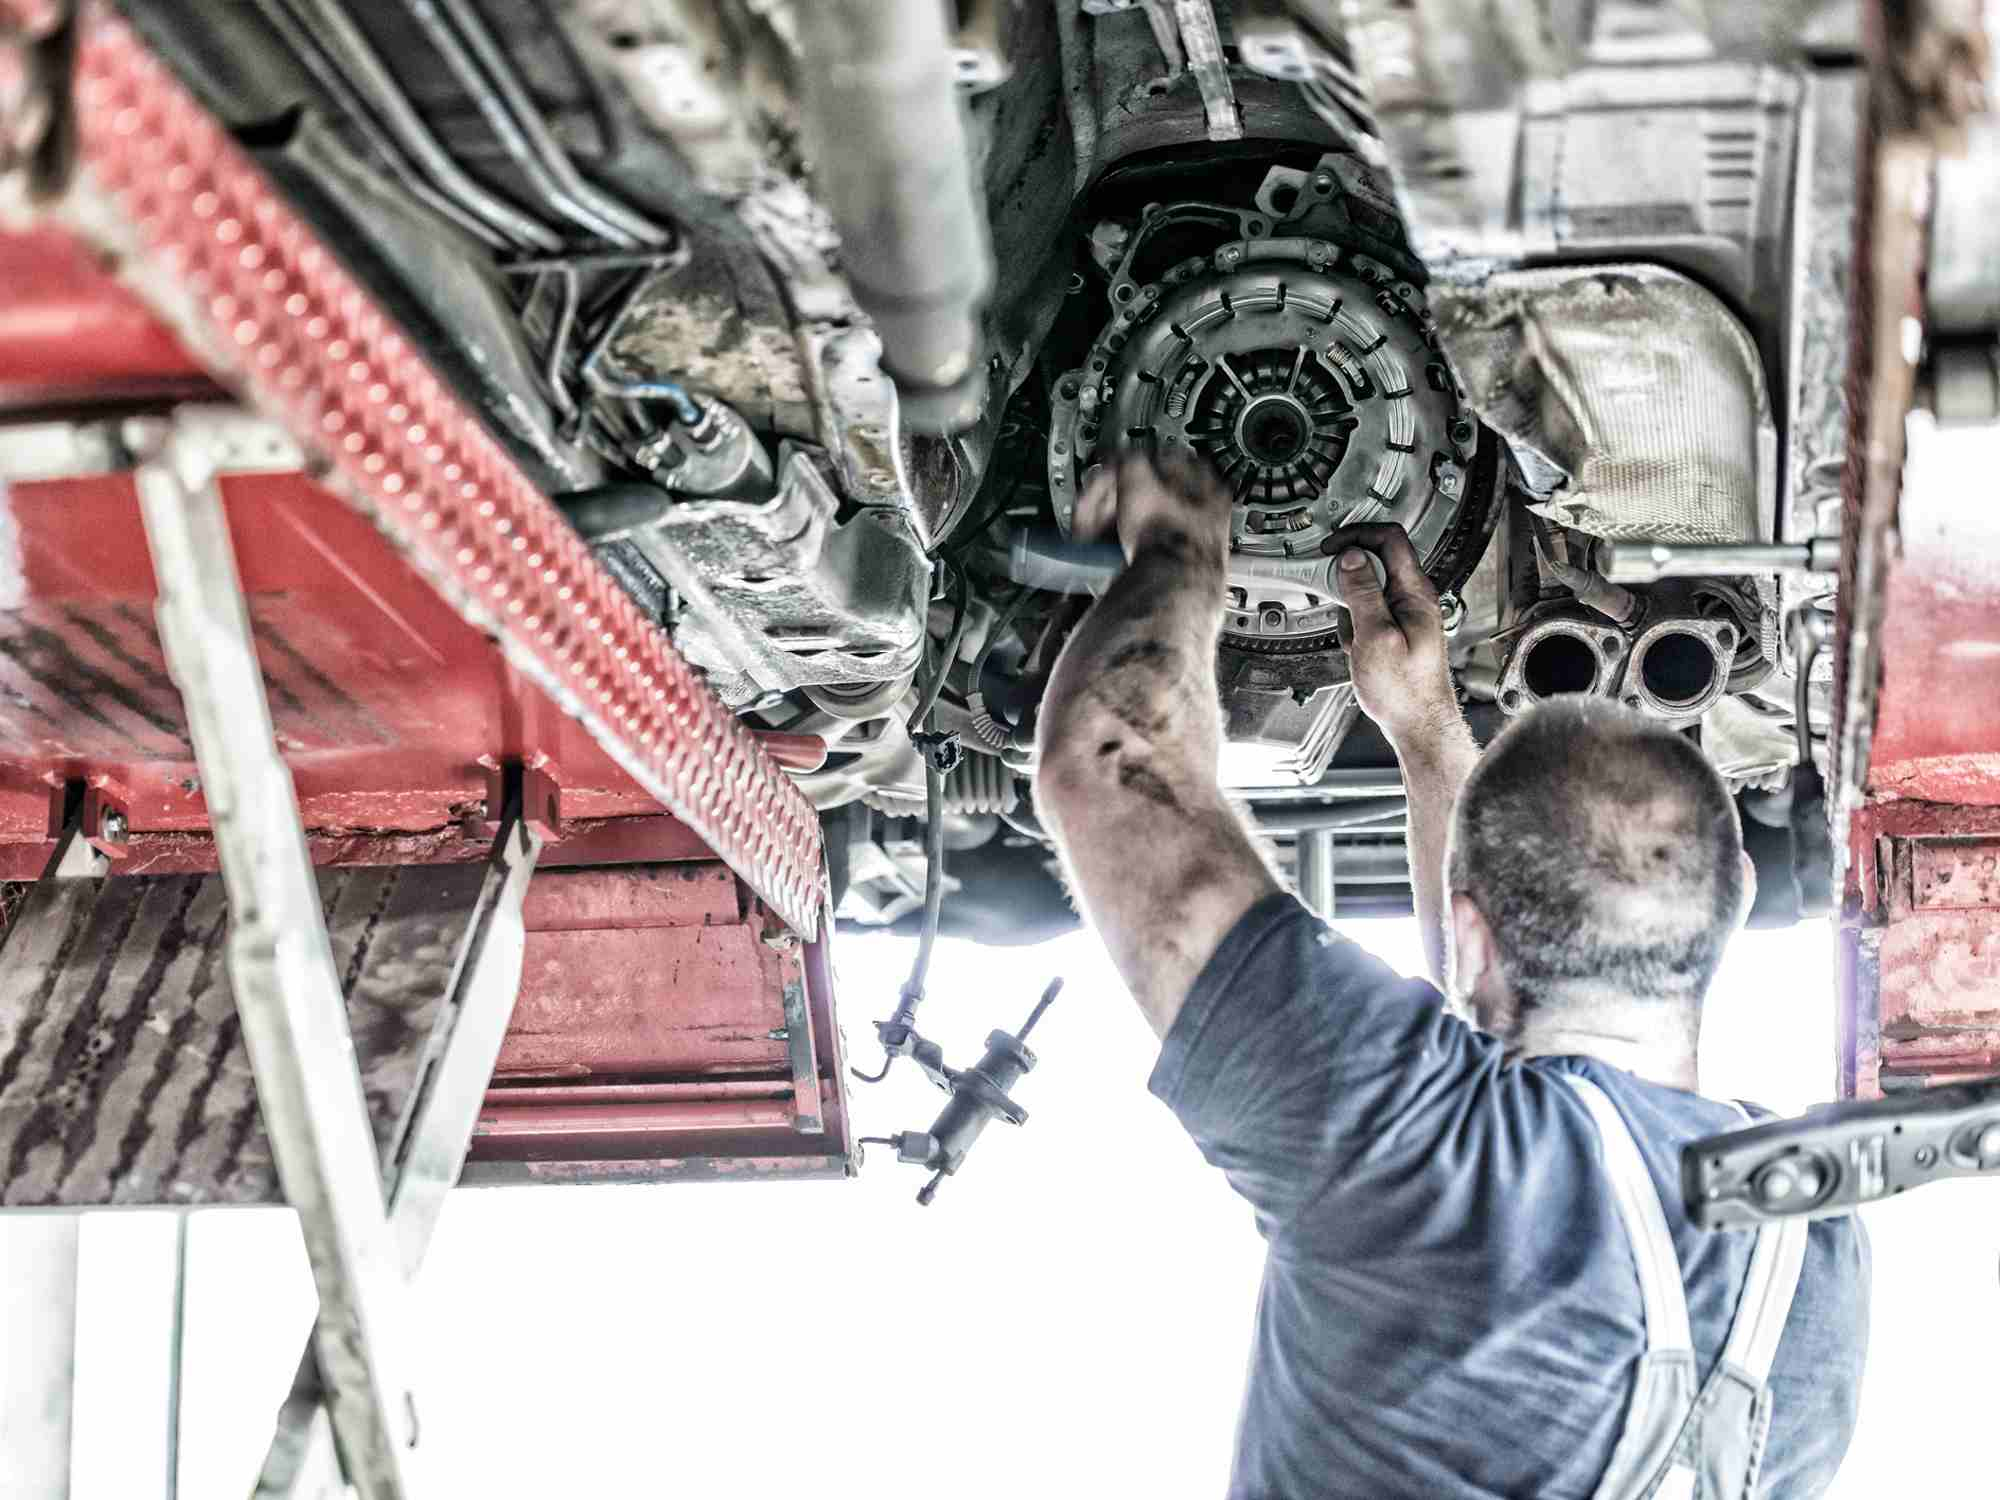 technician working on clutch